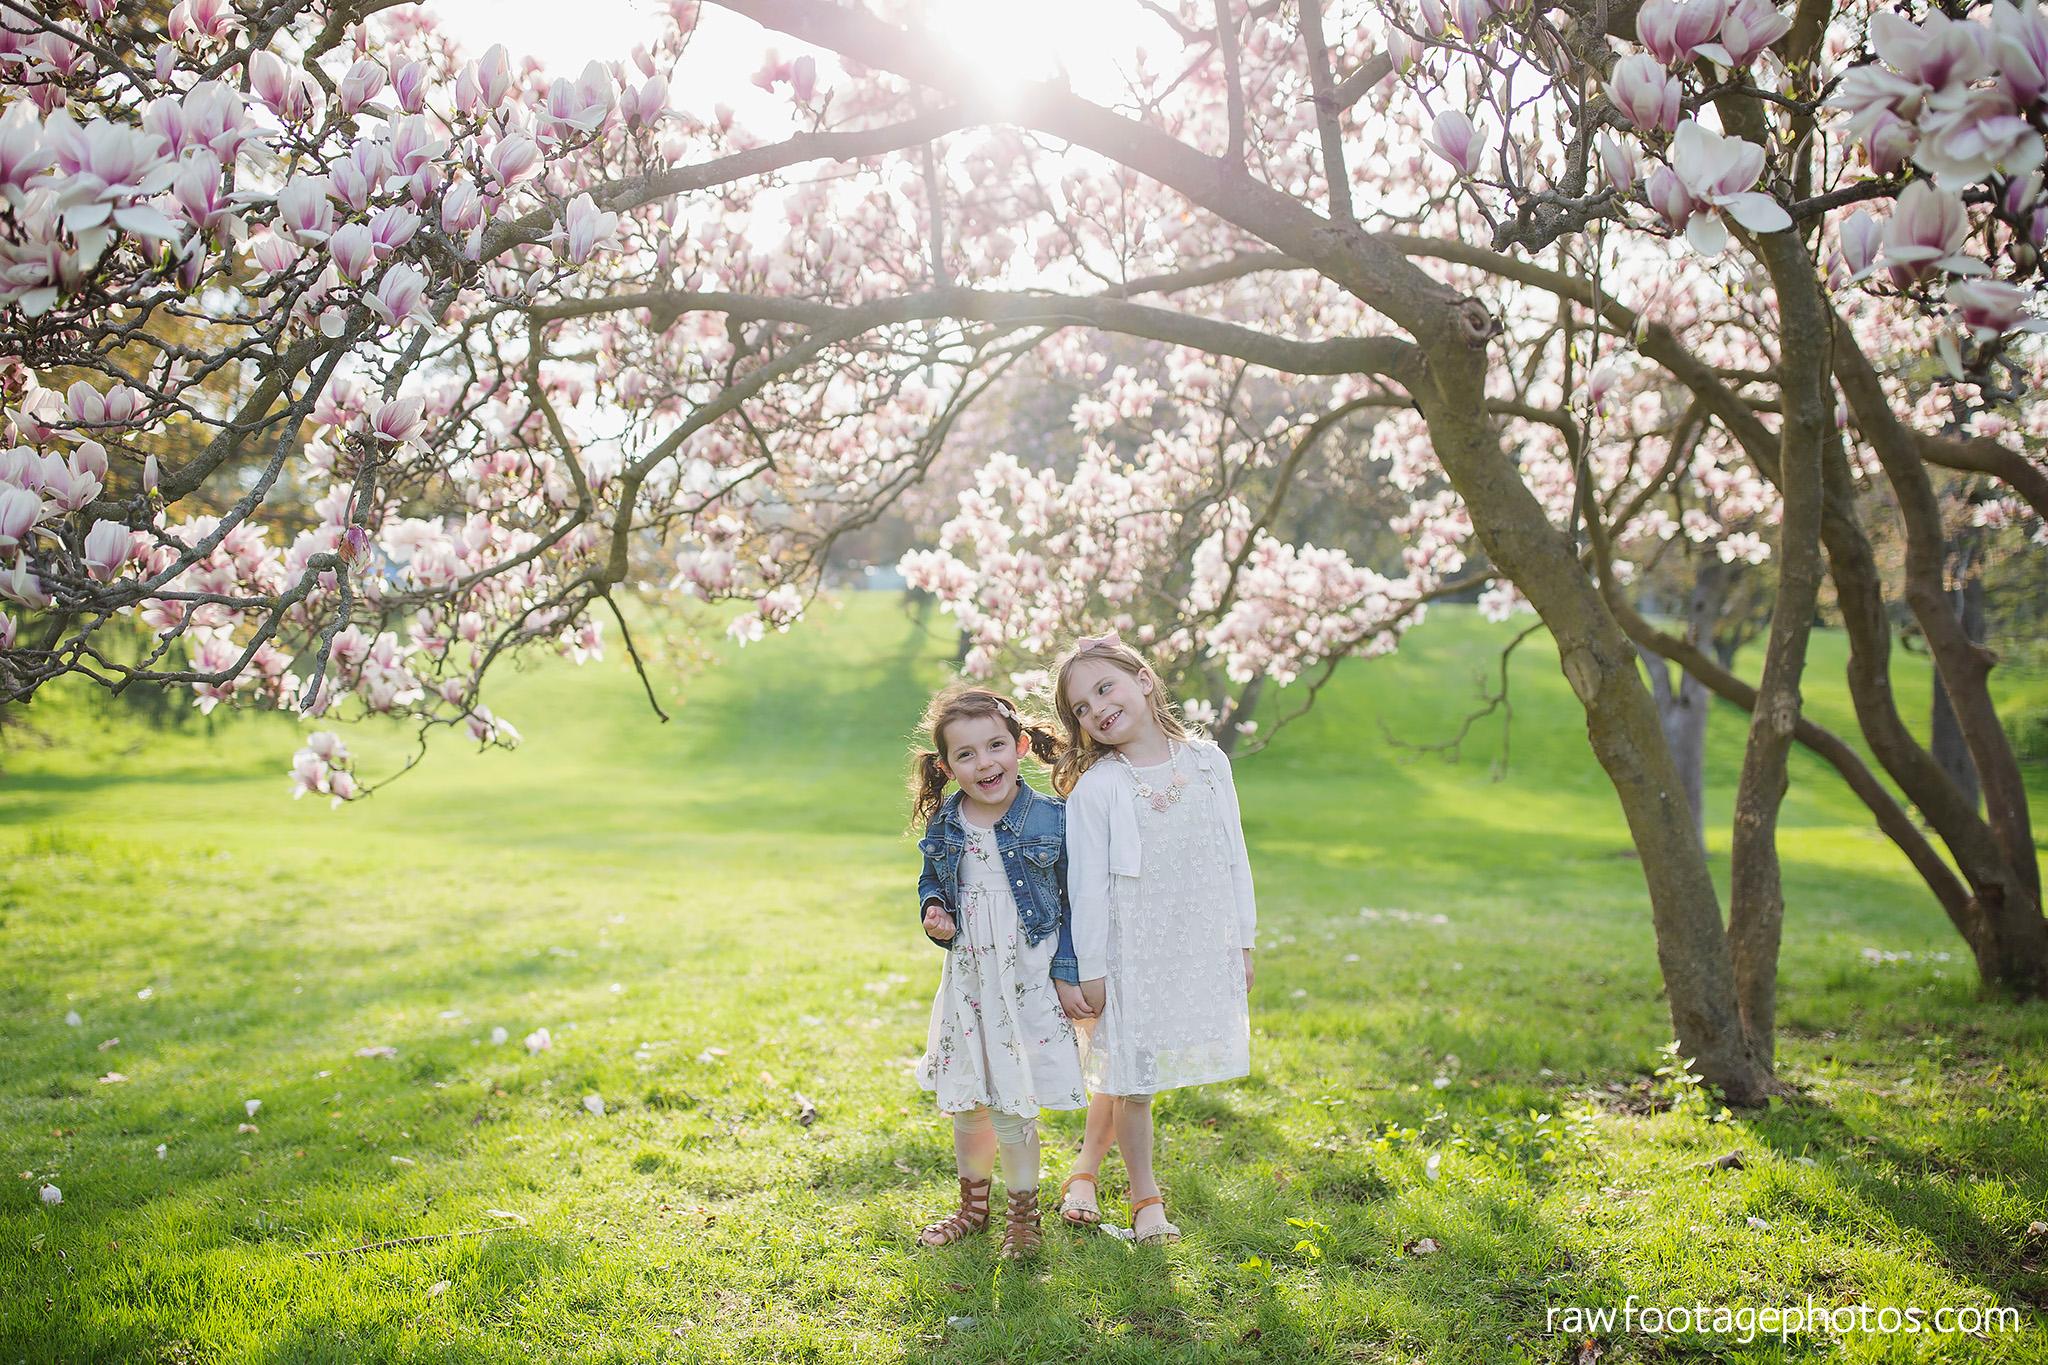 london_ontario_family_photographer-raw_footage_photography-spring_blossom_mini_sessions-magnolia-springbank_park032.jpg